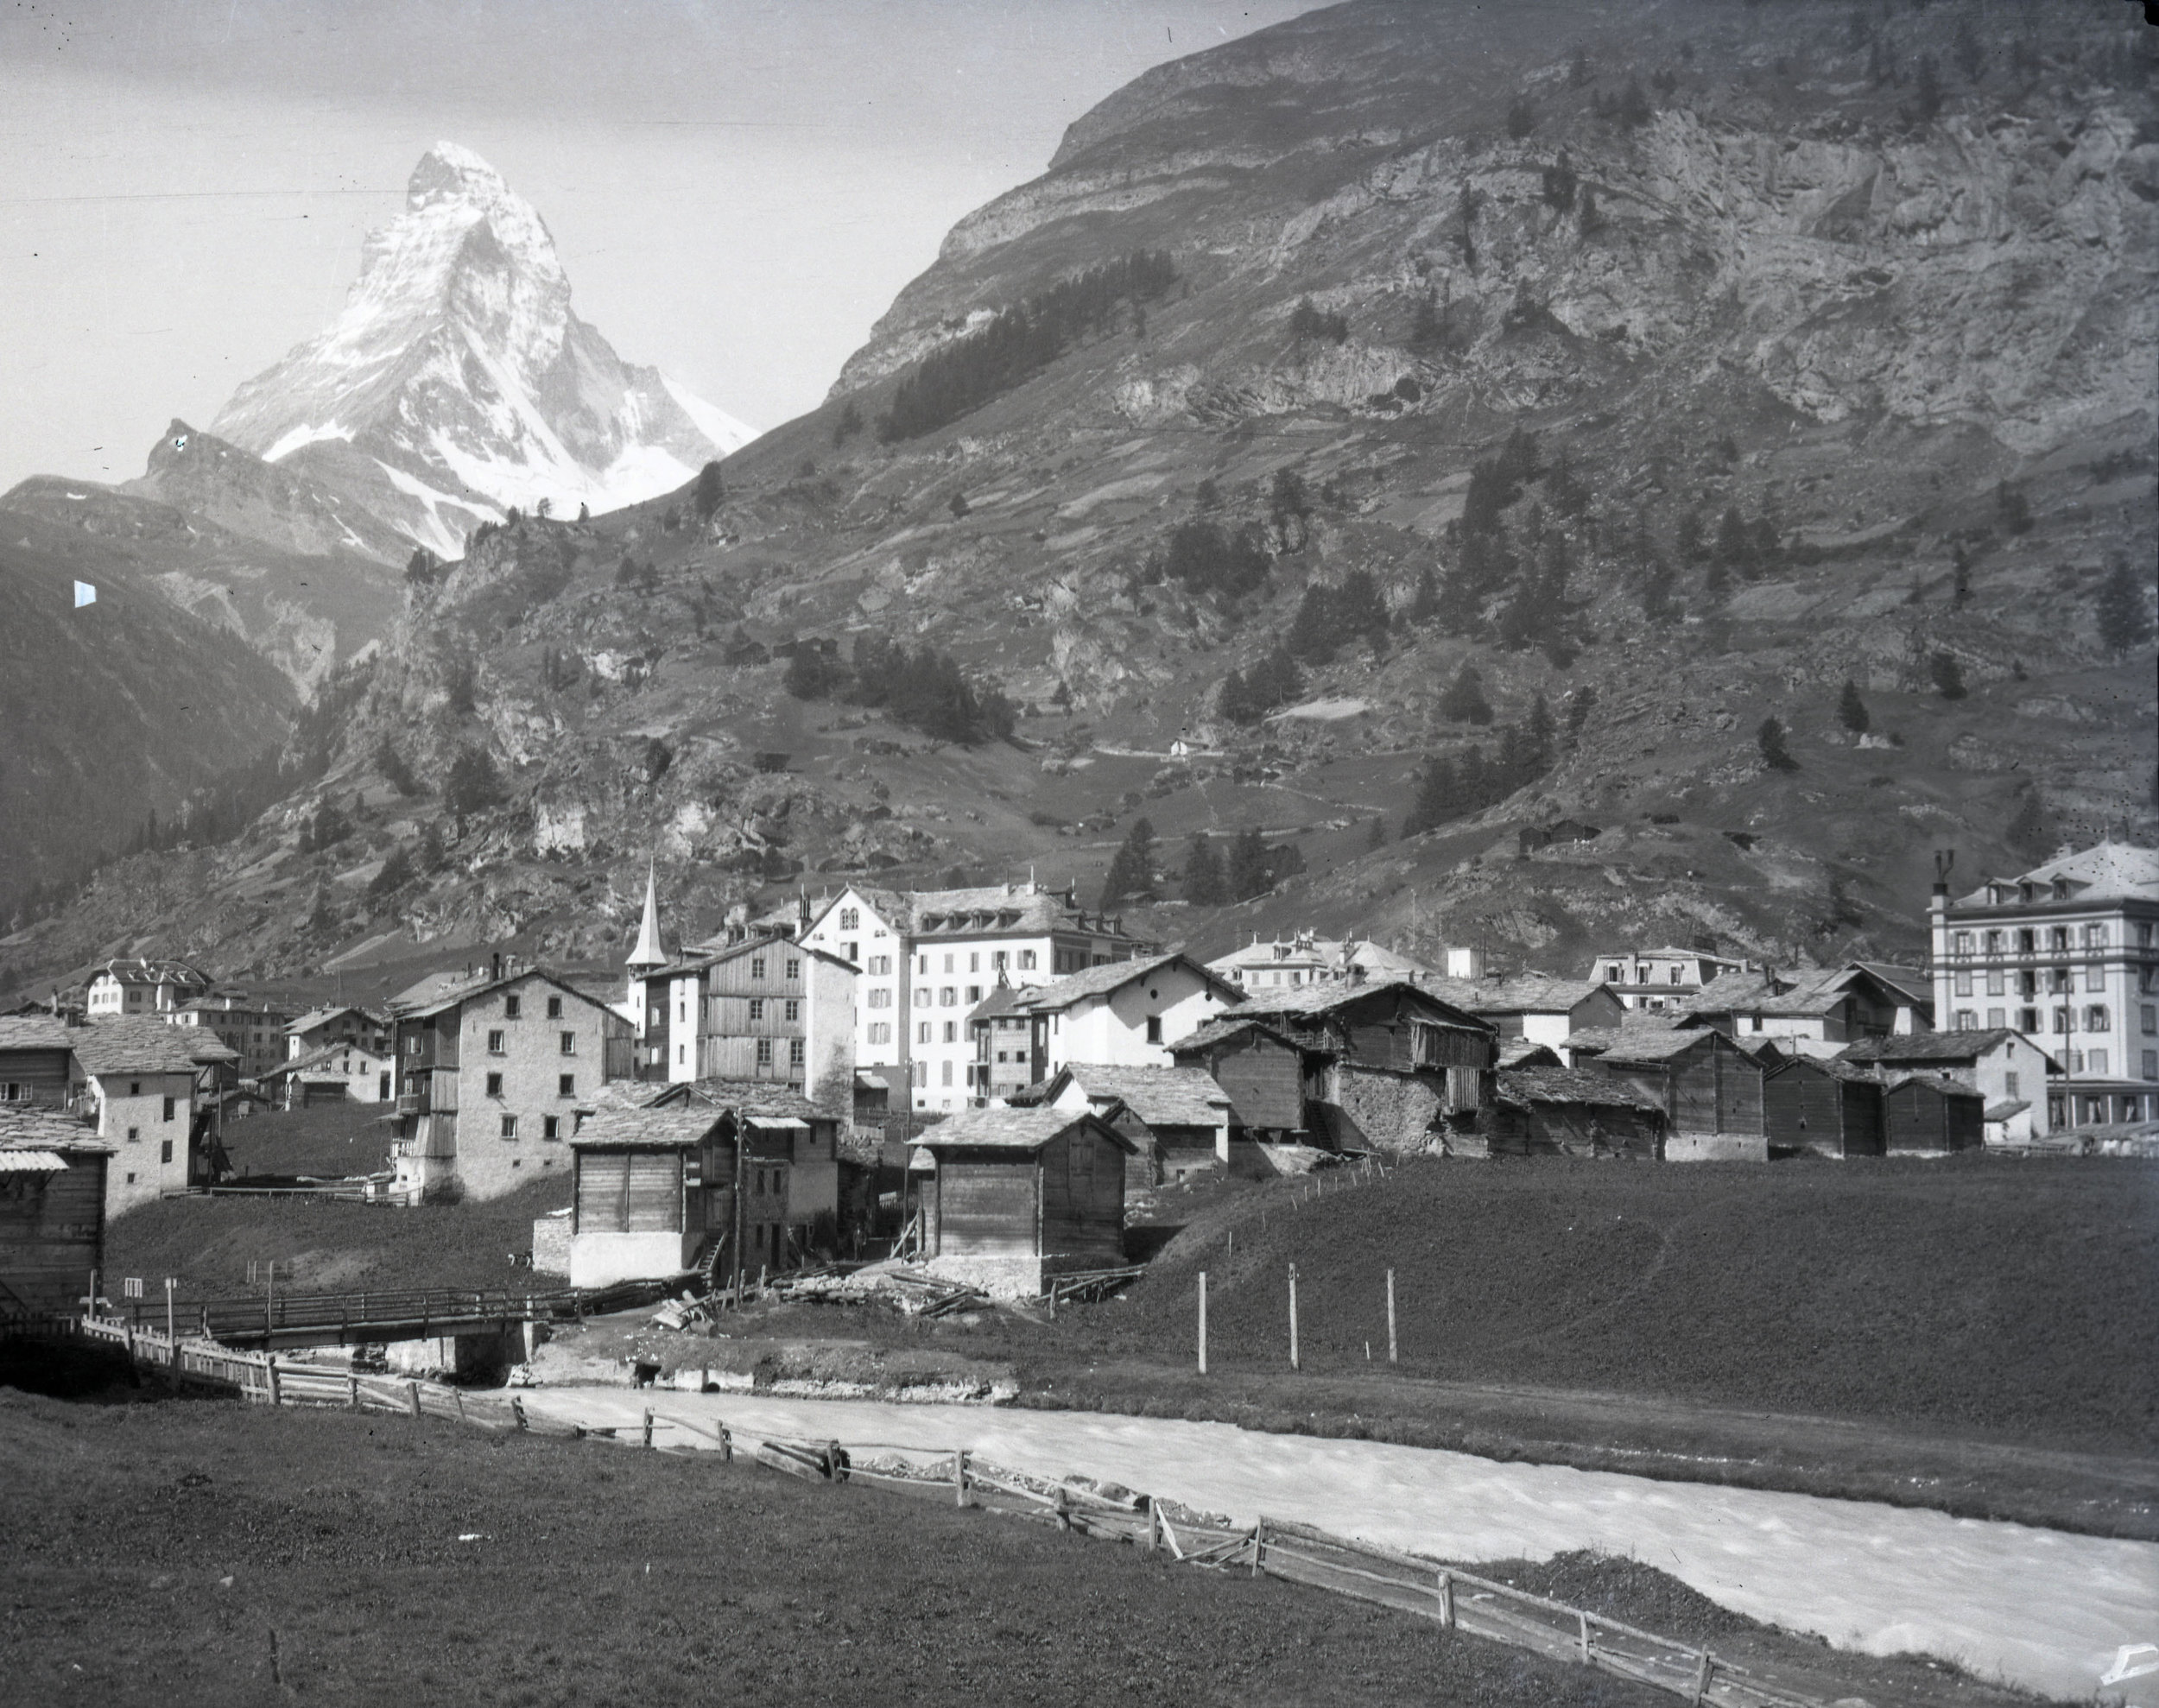 Zermatt, Switzerland and the Matterhorn